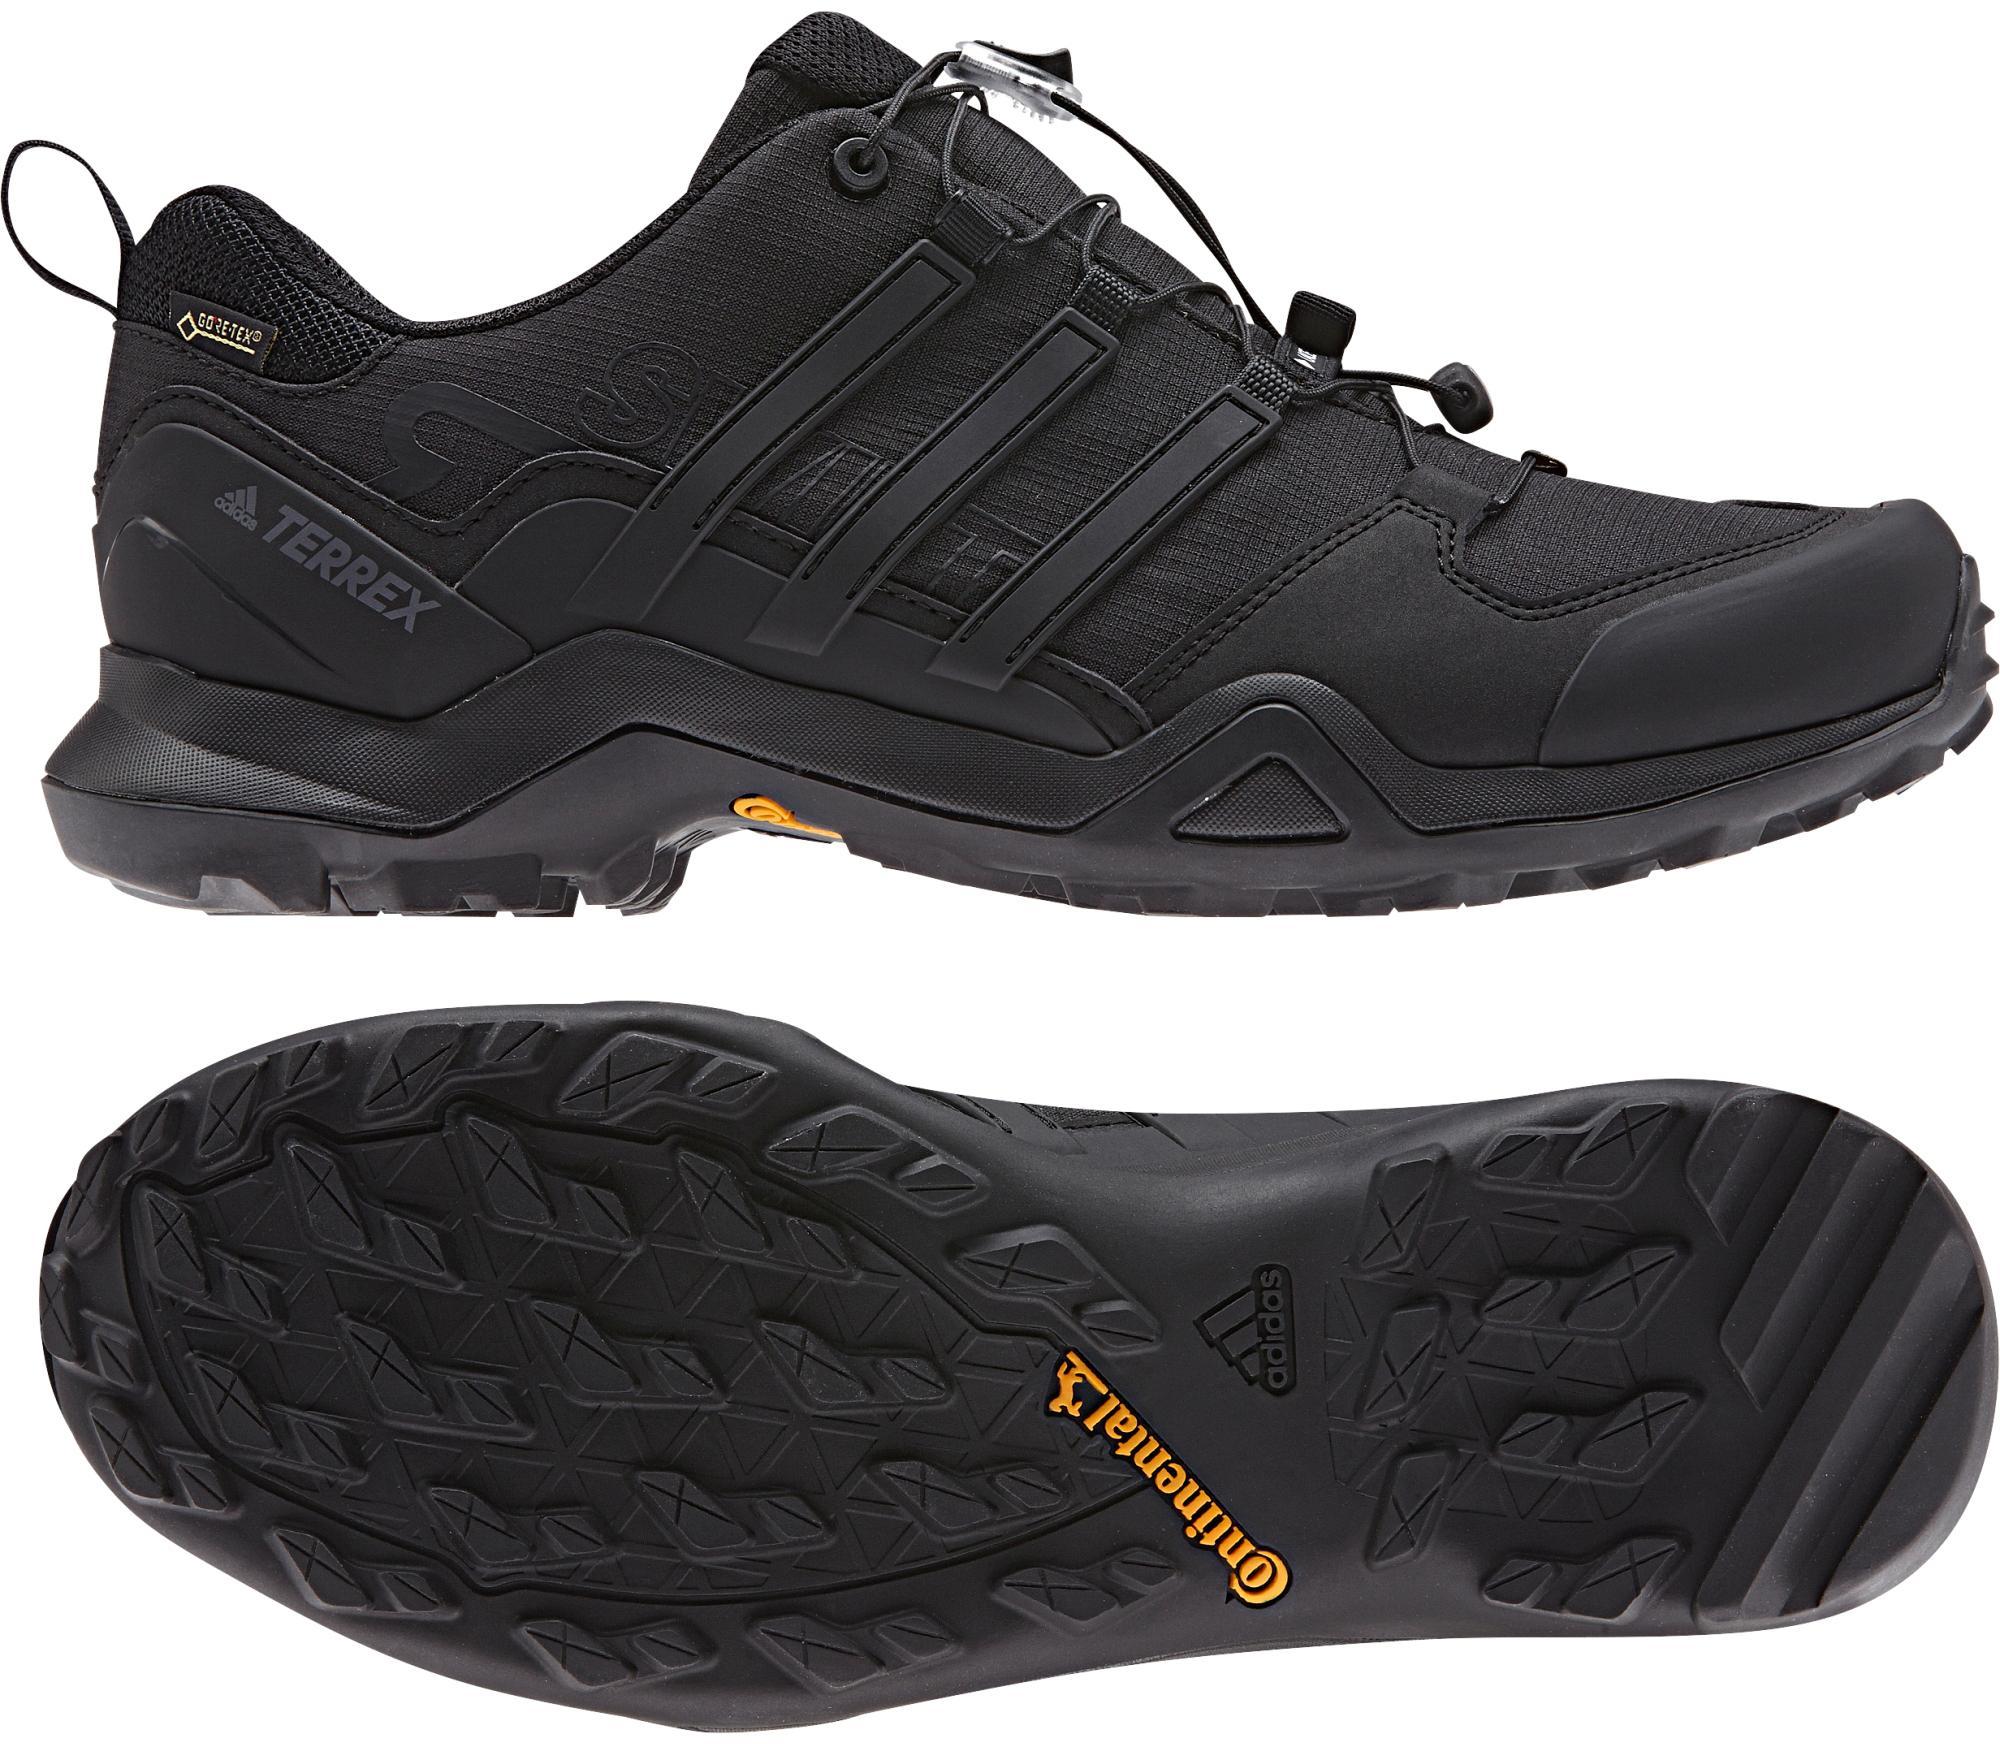 Adidas (2019) IM SALE Schuhe online | Jetzt bis zu -60% | SPOT-A-SHOP